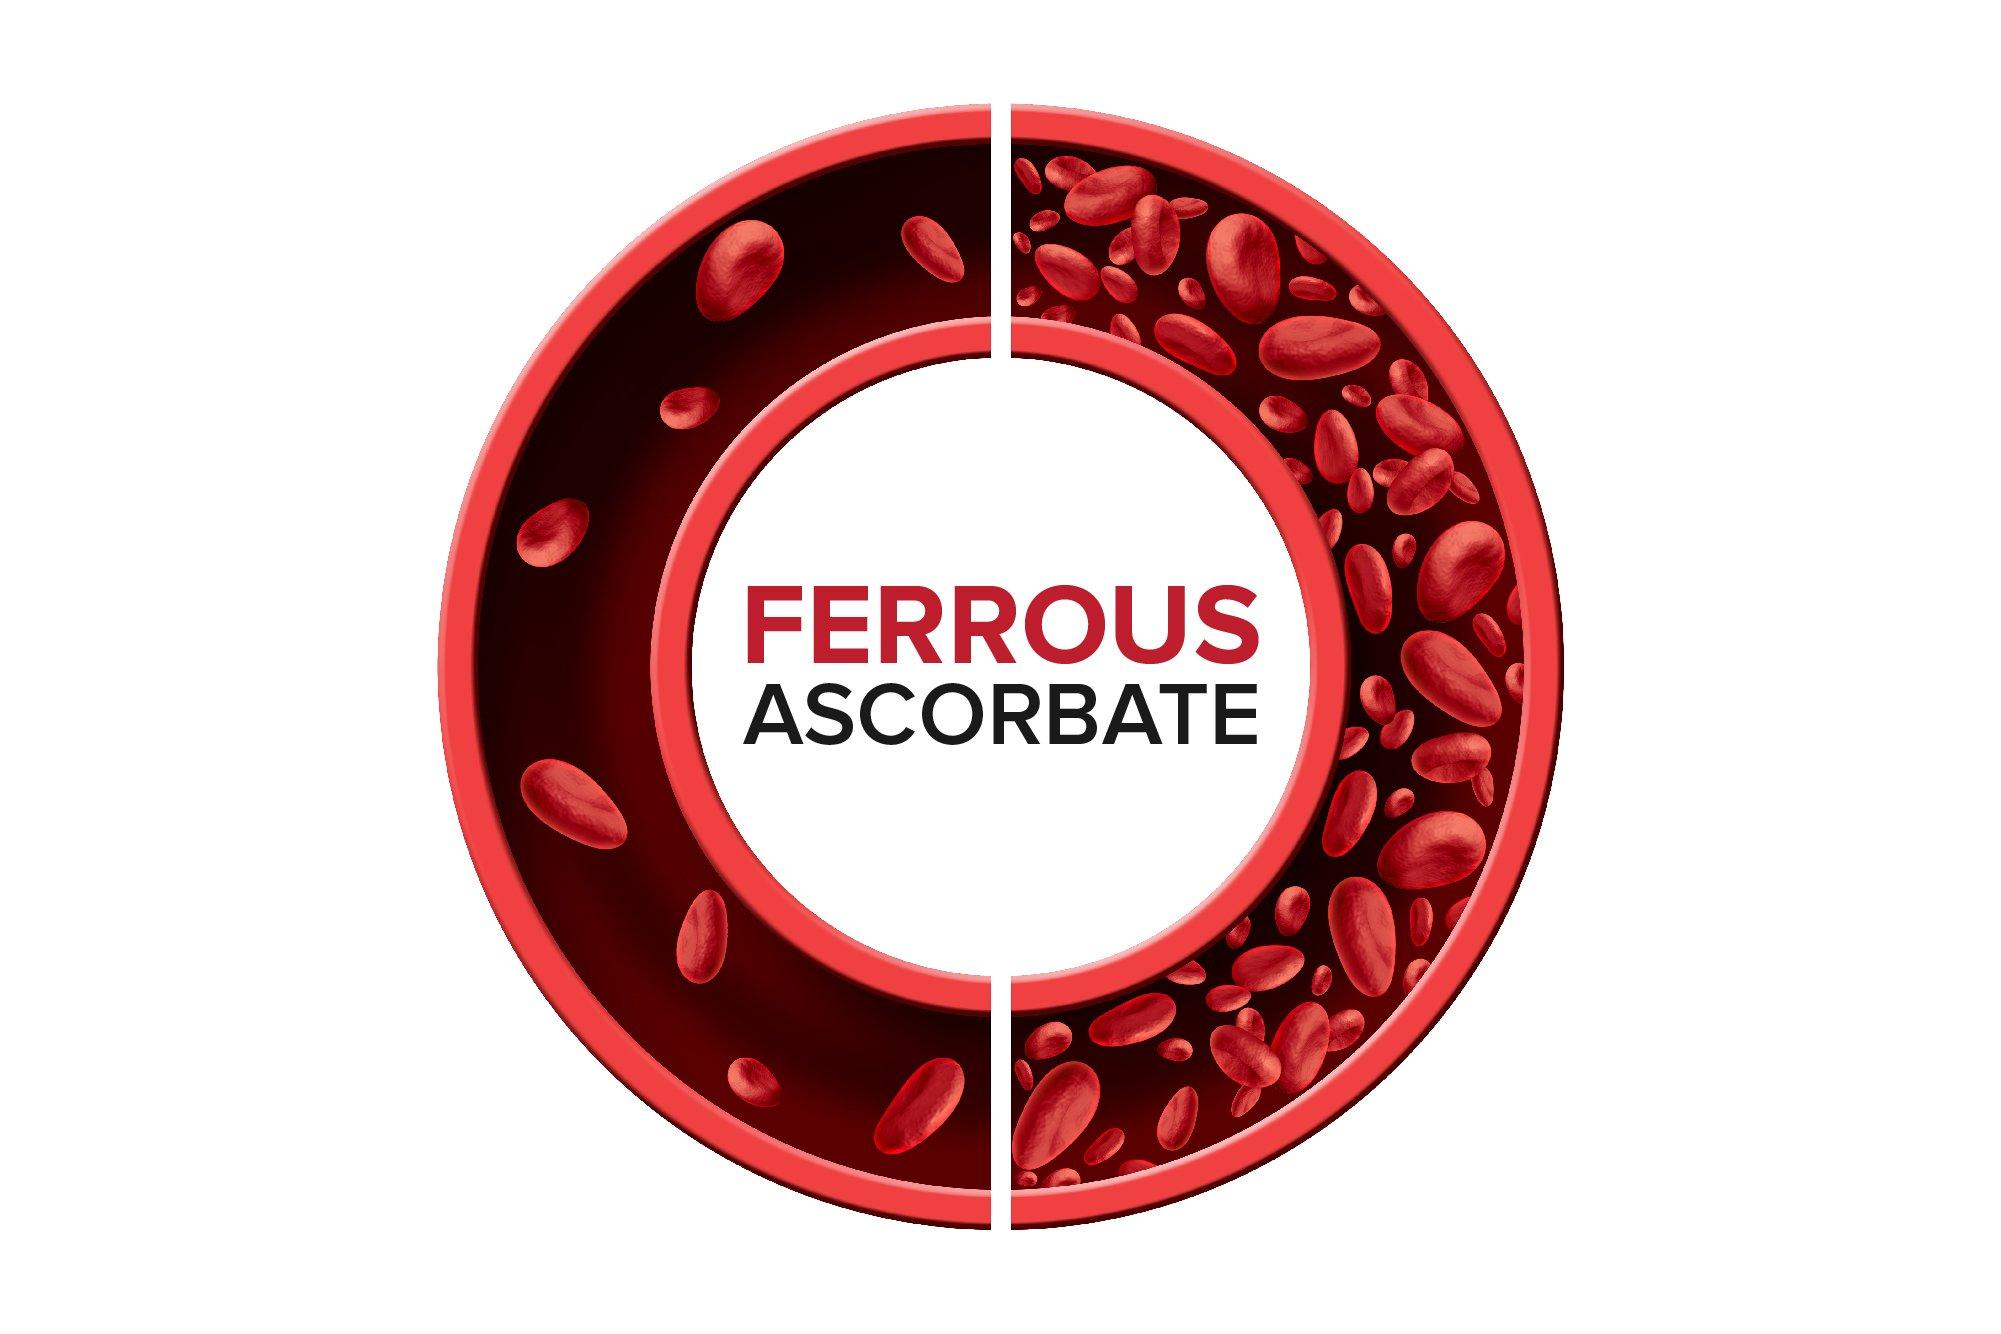 Iron deficiency anemia_Ferrous Ascorbate